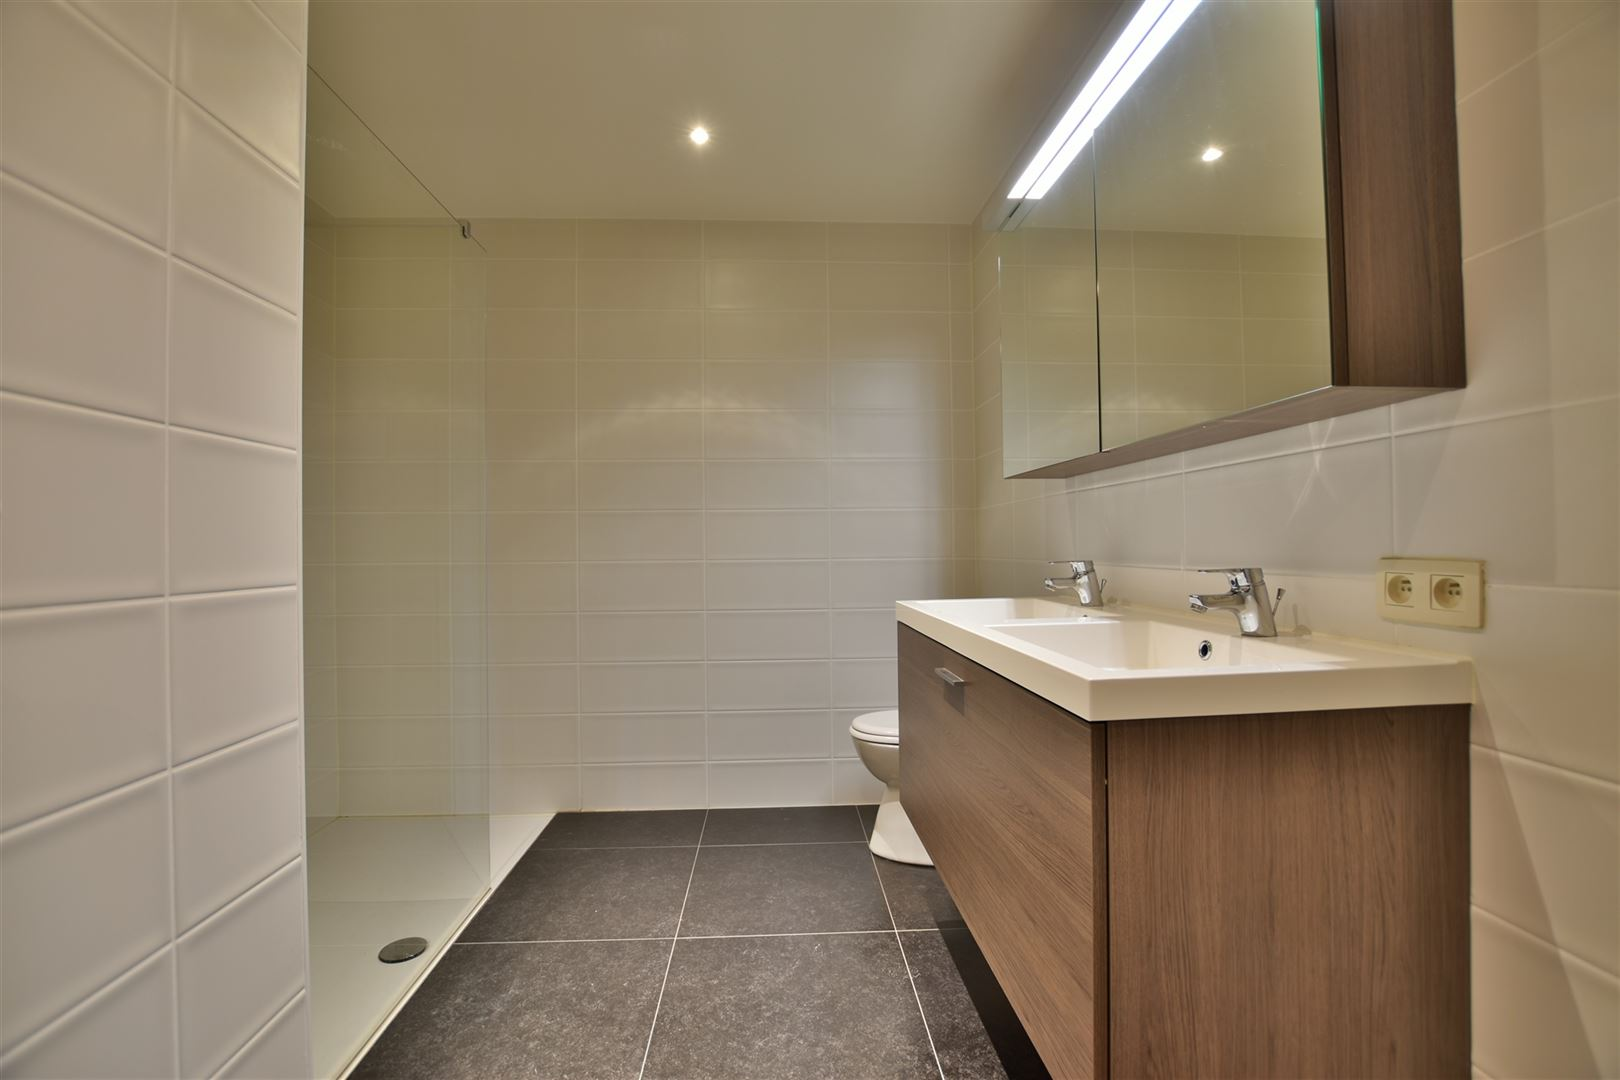 Foto 20 : Duplex/Penthouse te 9200 Sint-Gillis-bij-Dendermonde (België) - Prijs € 278.000